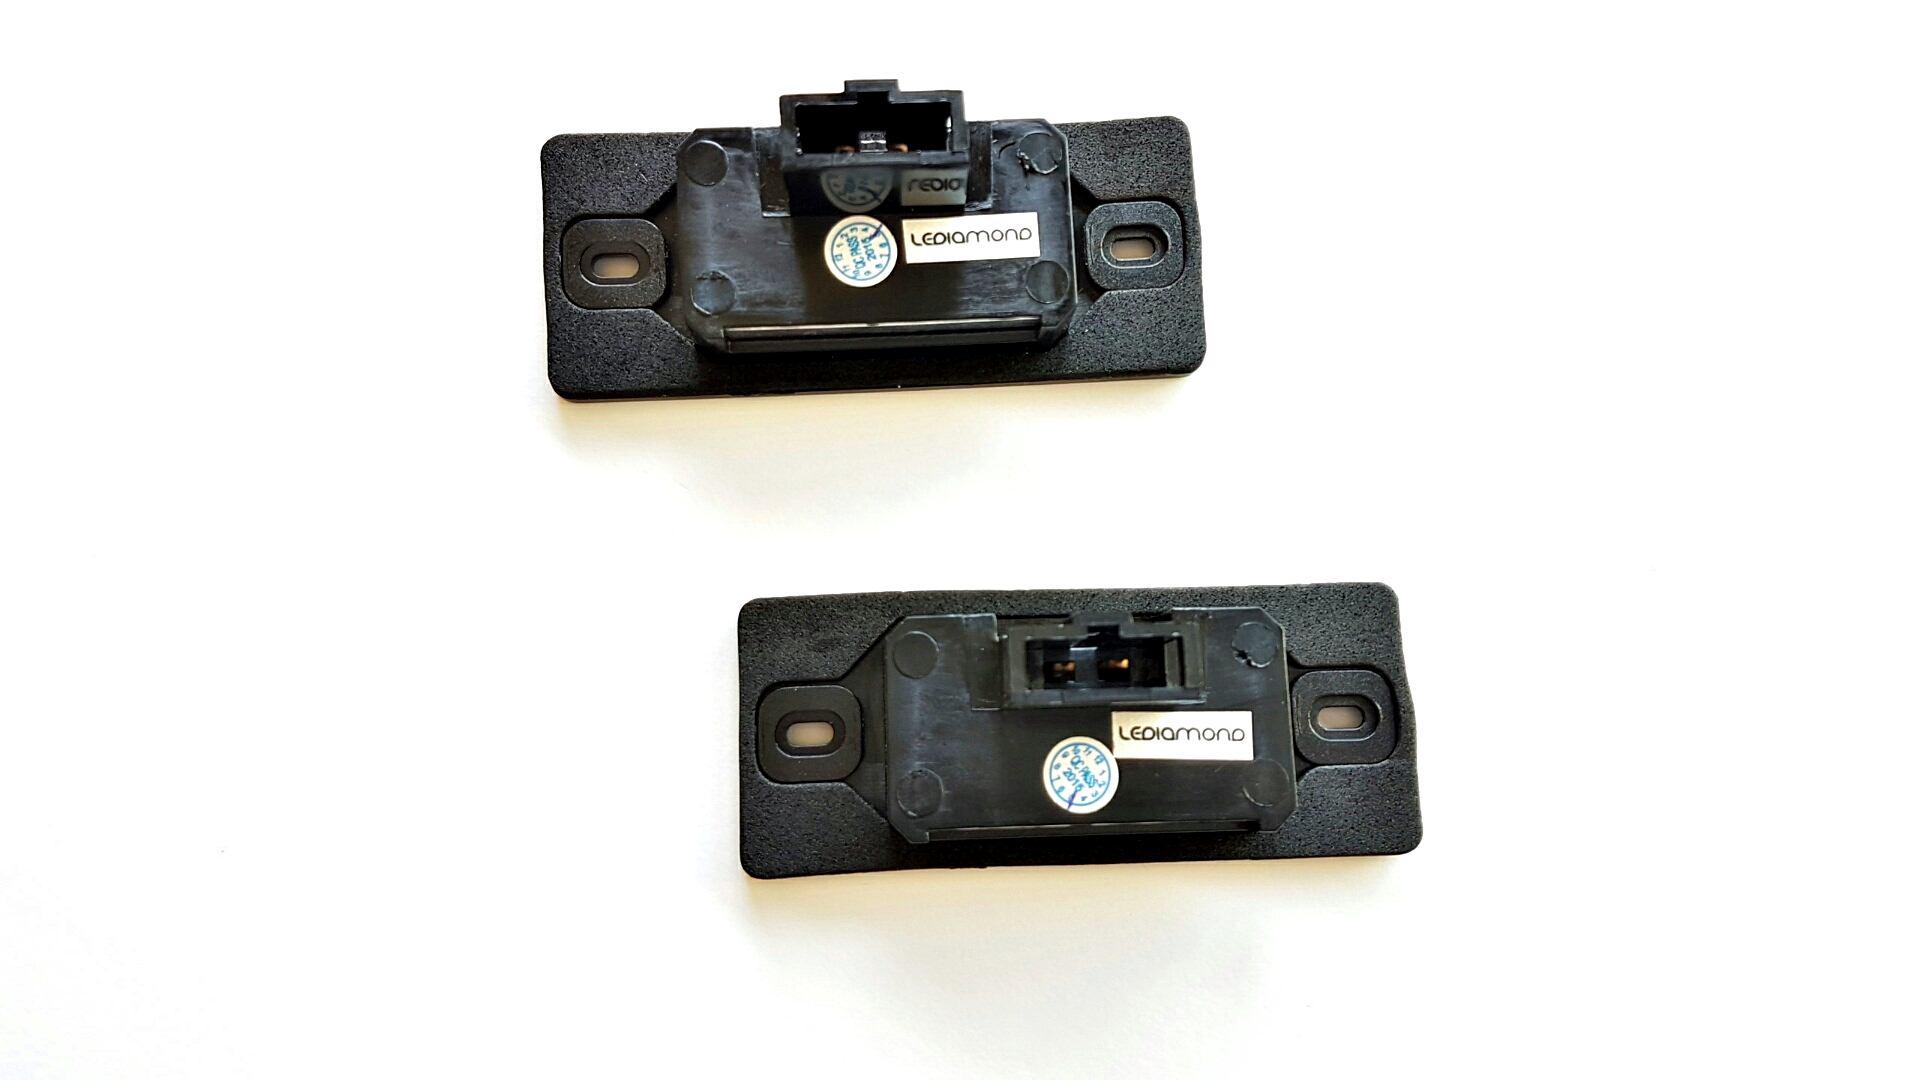 PLAFONES MATRICULA LED AUDI TT TTS TT ROADSTER LEDIAMOND LMD030806 (3)